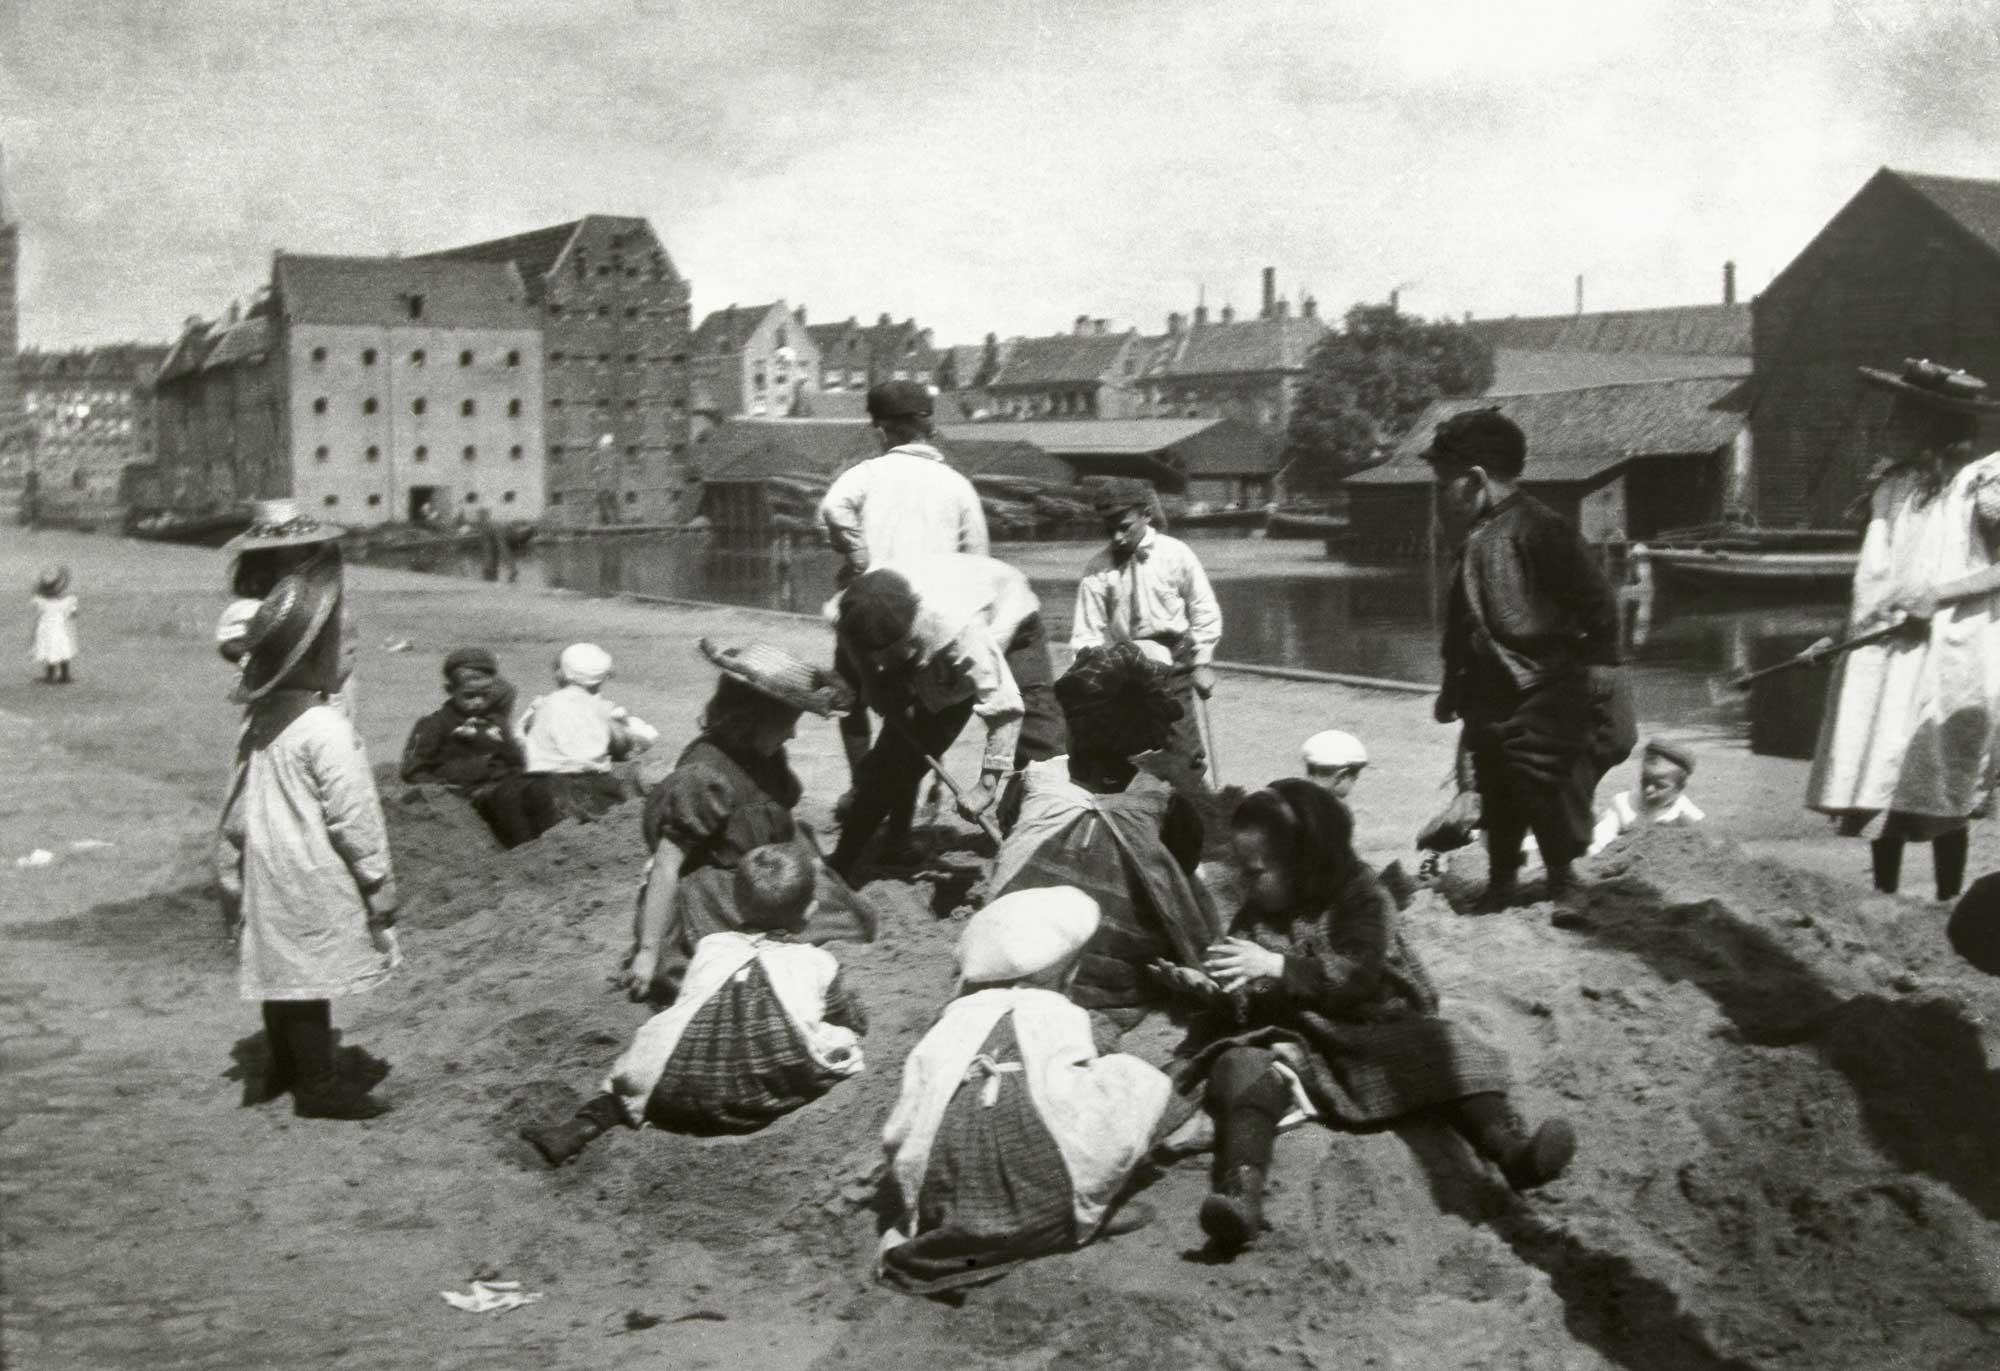 Children play in a sand dump near Prince Island.